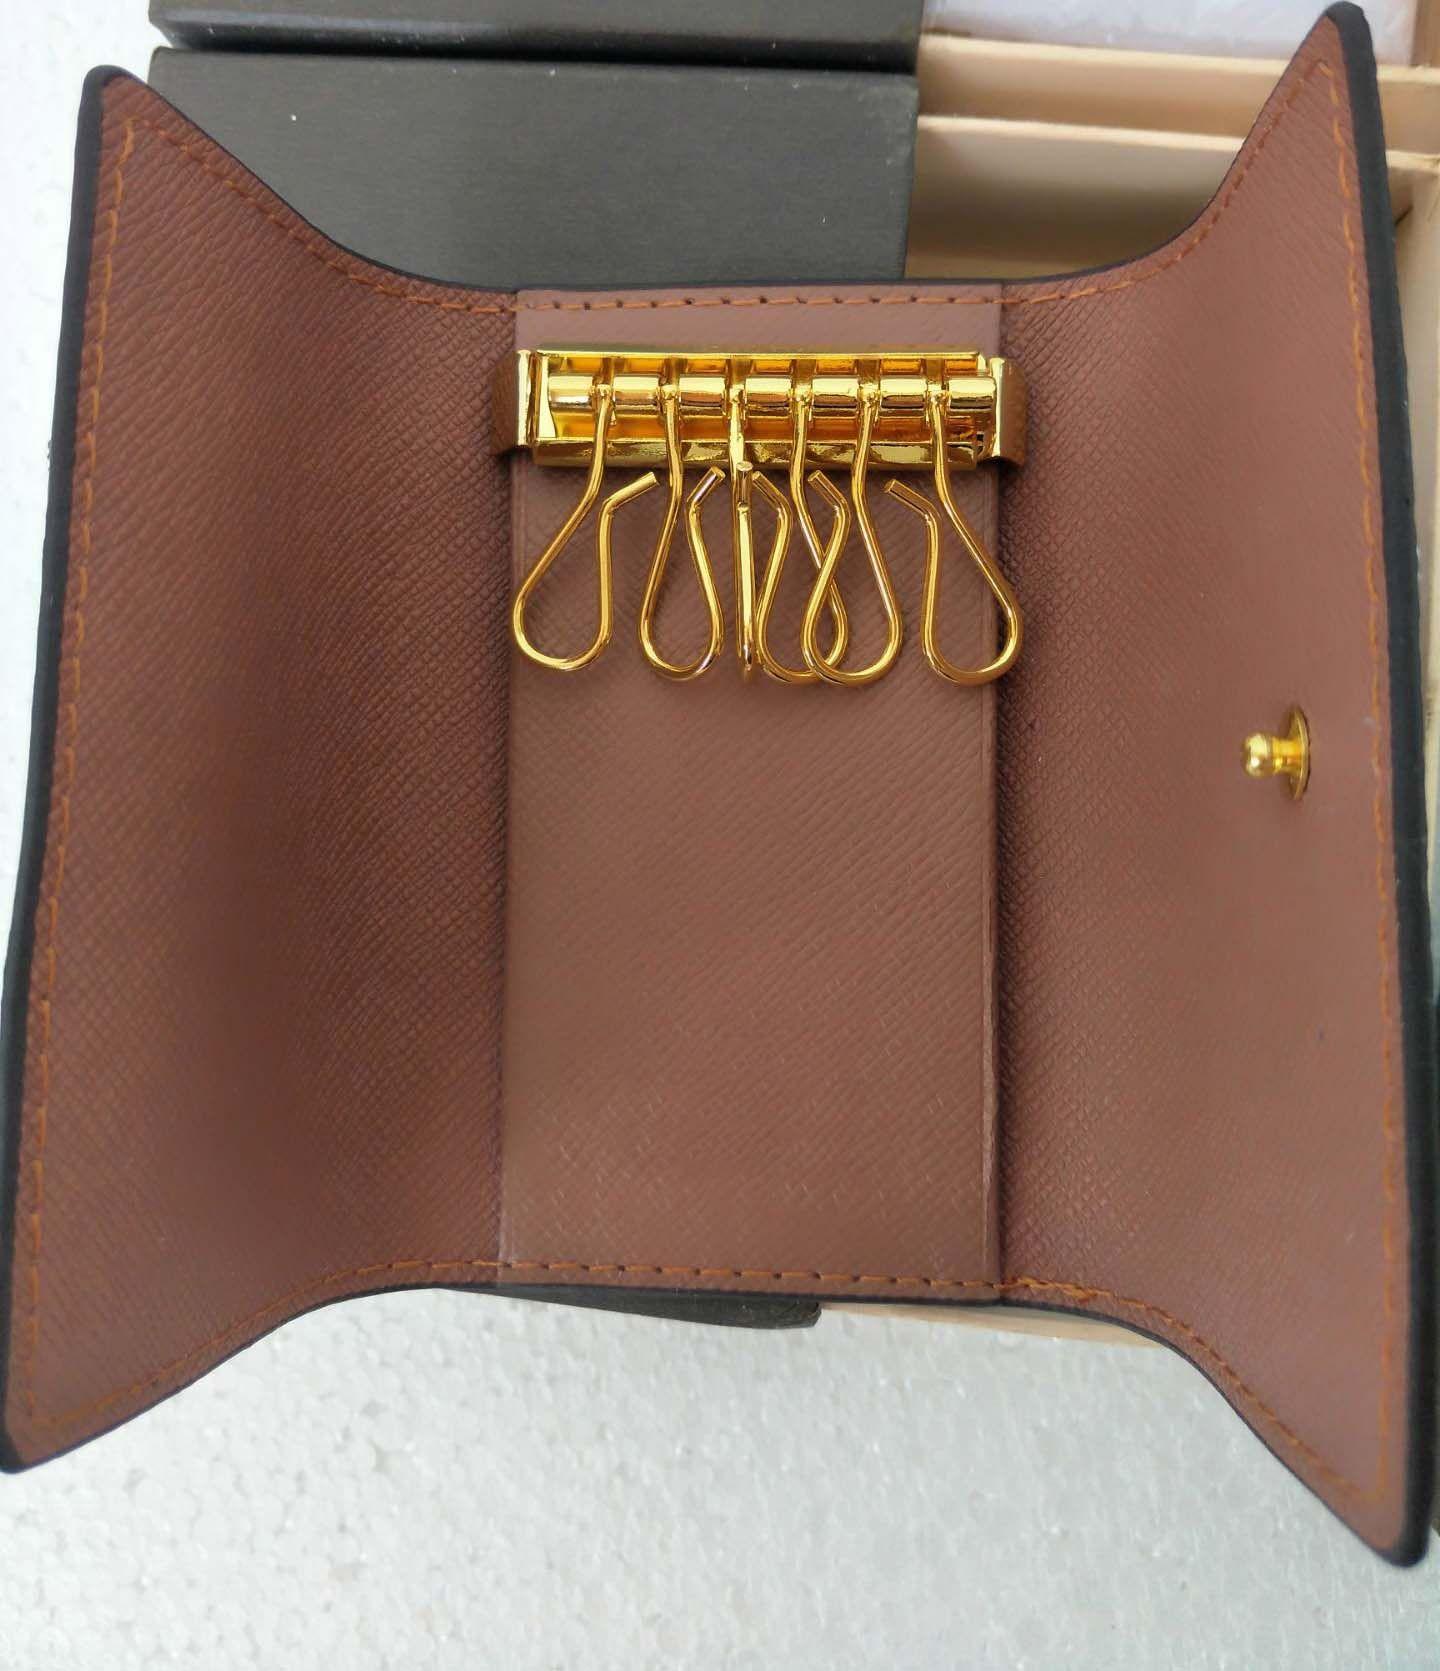 KEY POUCH Damier Canvas Holds High Quality Famous Classical Designer Women  6 Key Holder Coin Purse Leather Men Card Holders Wallet Handbag Key Wallet  Purse ... 60a42bd6963